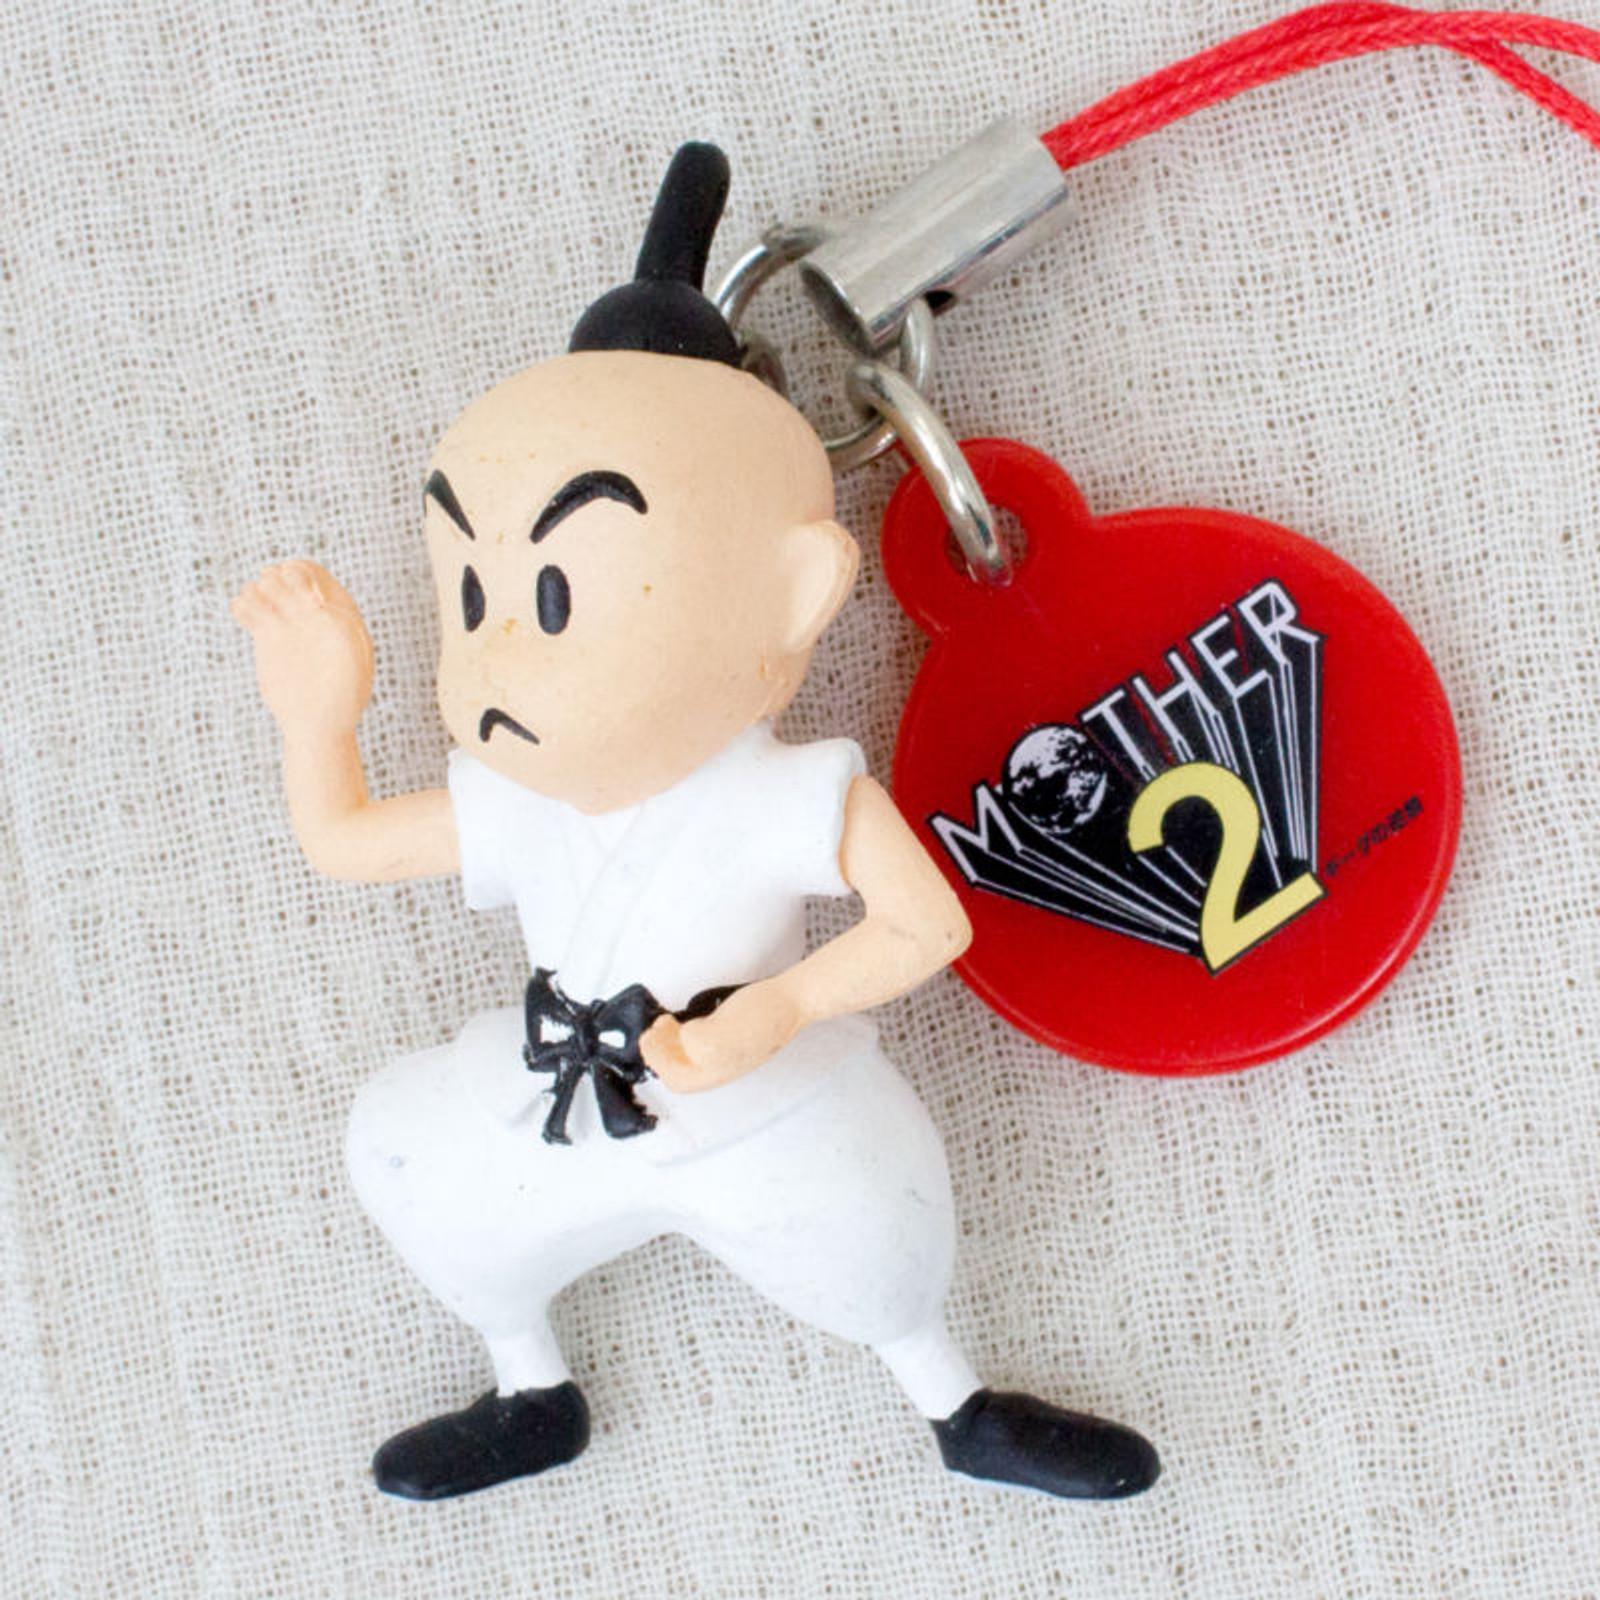 MOTHER 2 Poo Figure Strap Nintendo Takara Tomy JAPAN GAME NES FAMICOM